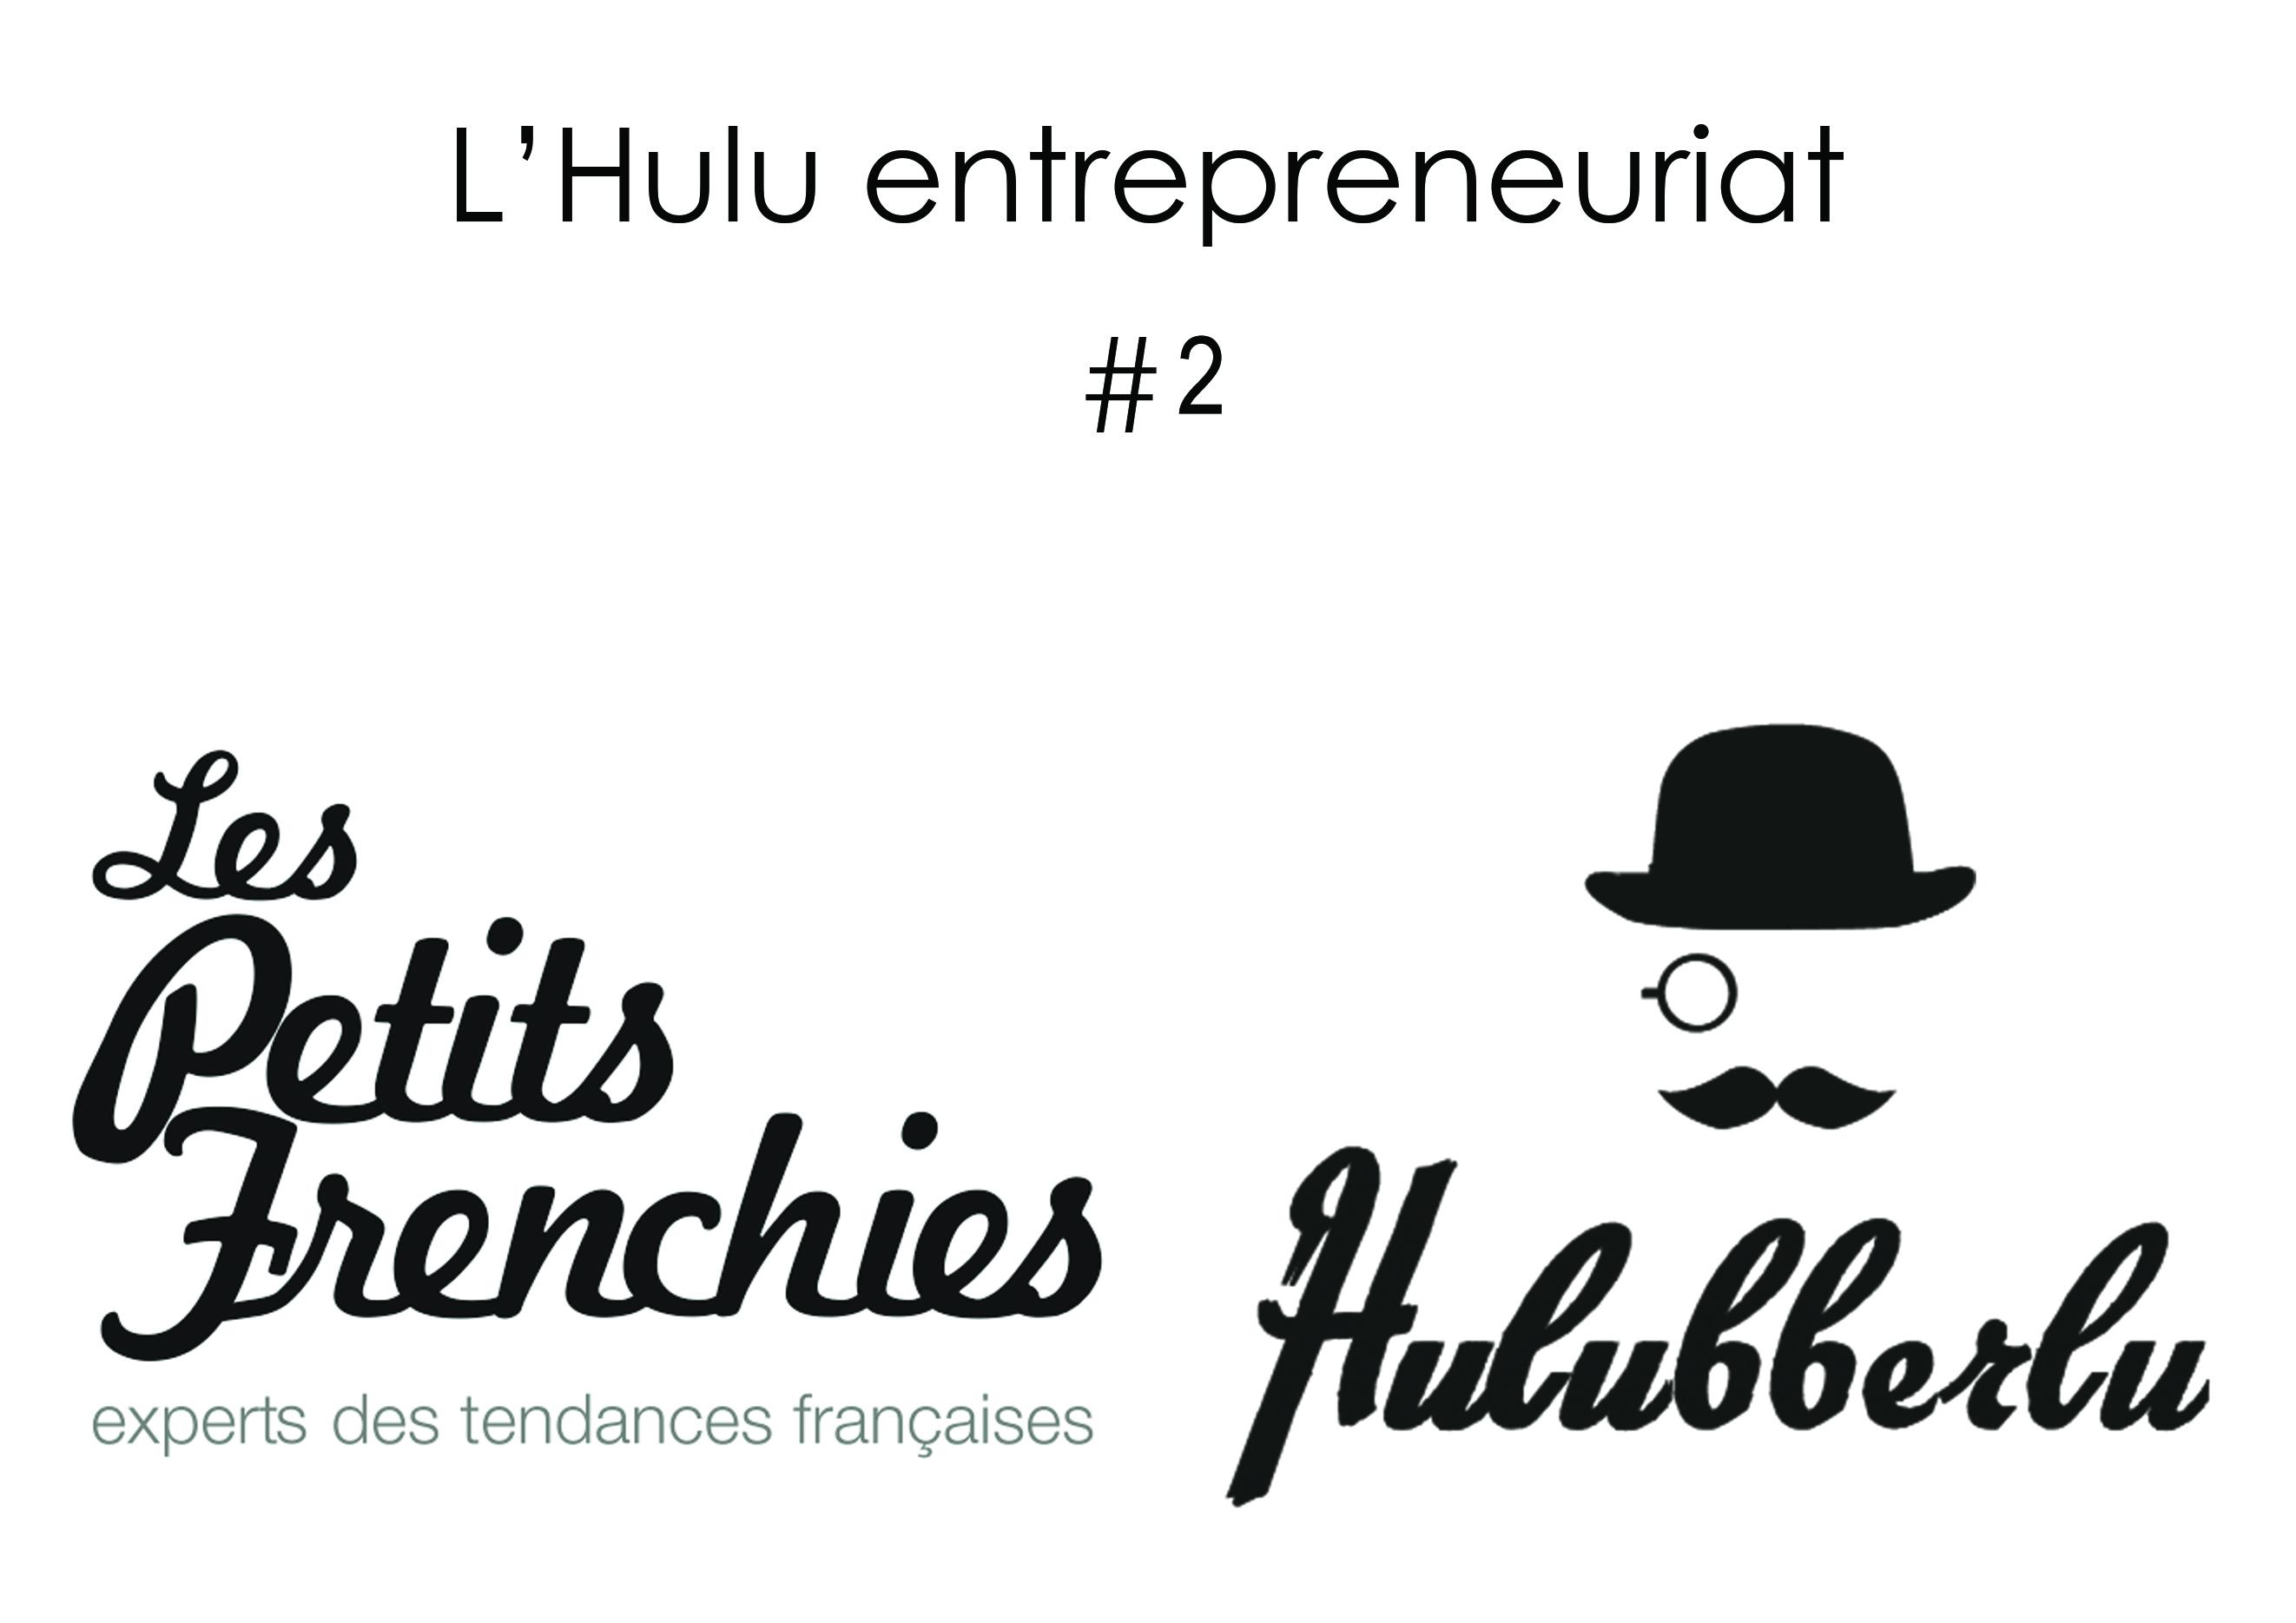 LesPetitsFrenchies entrepreneuriat